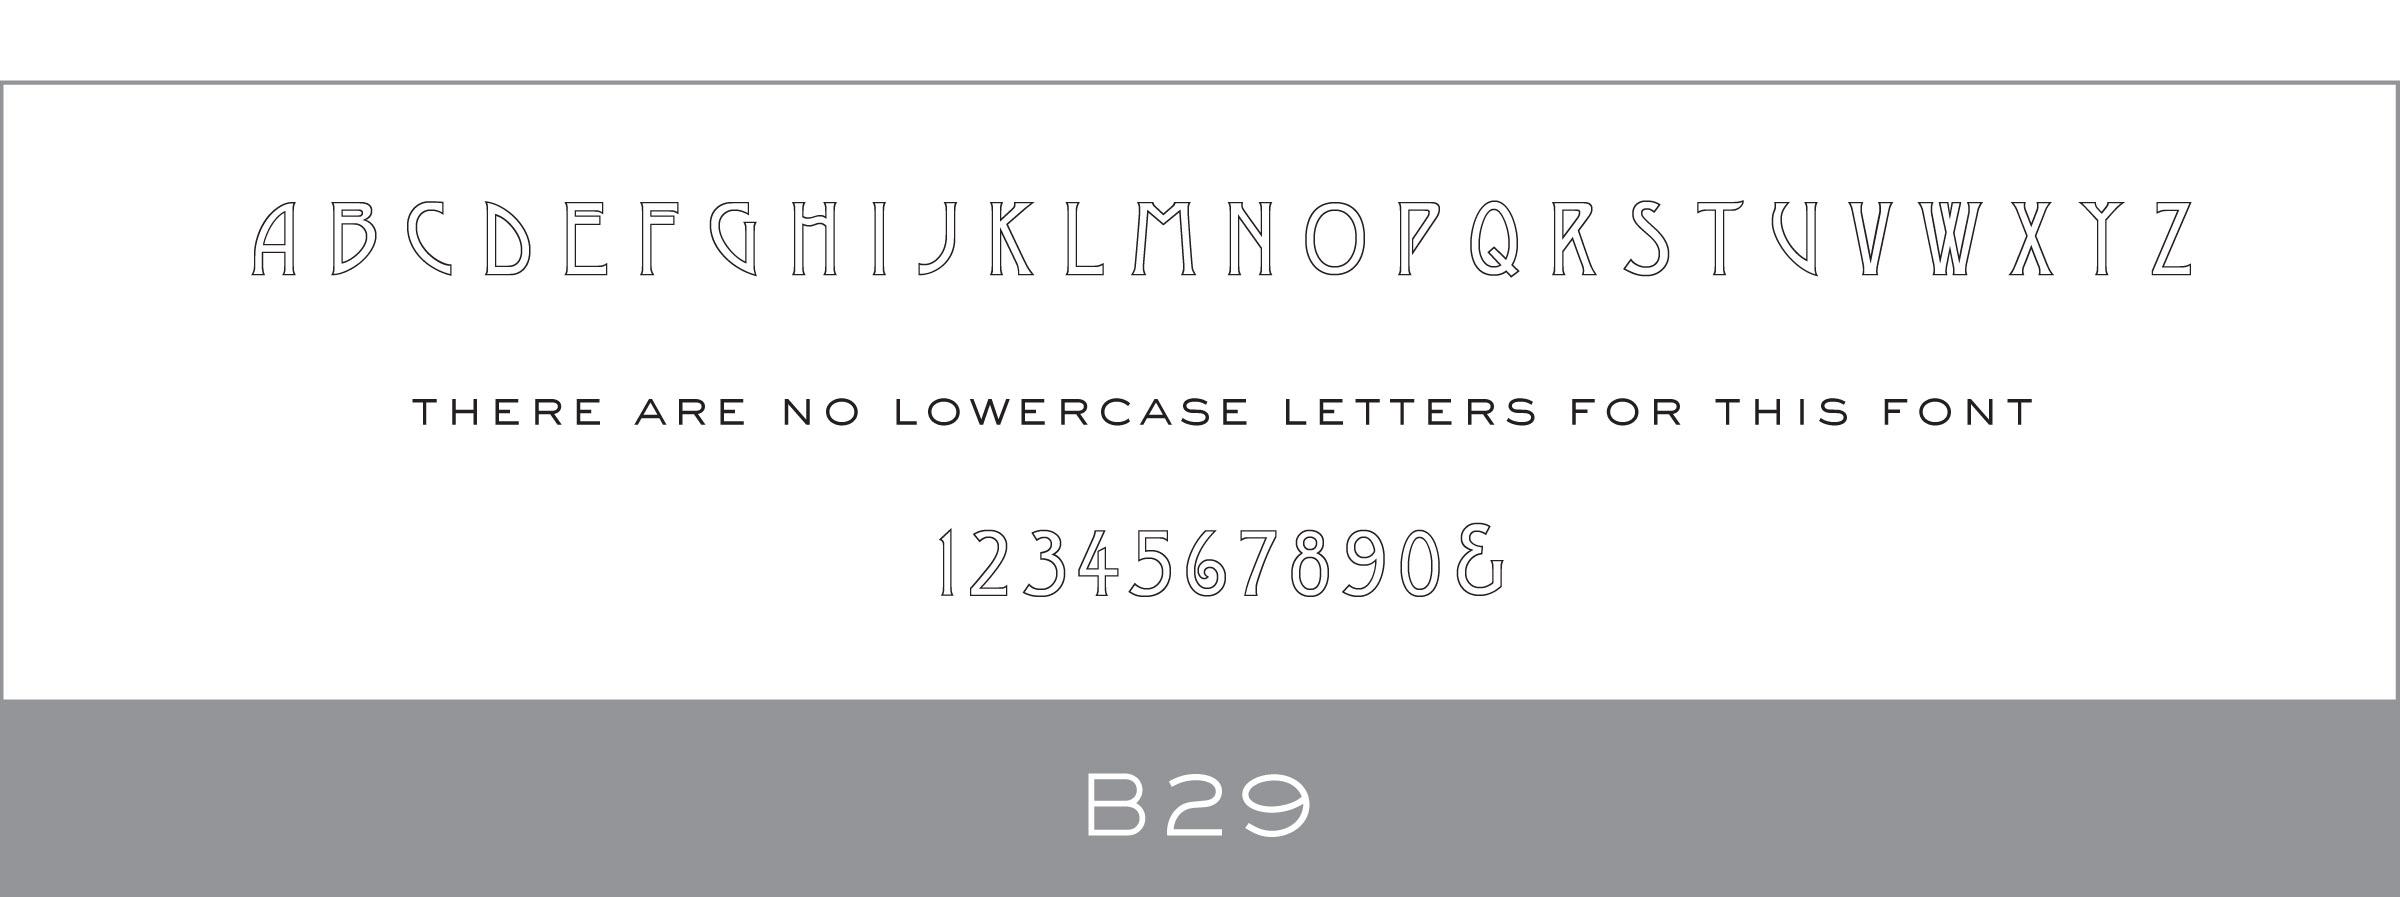 B29_Haute_Papier_Font.jpg